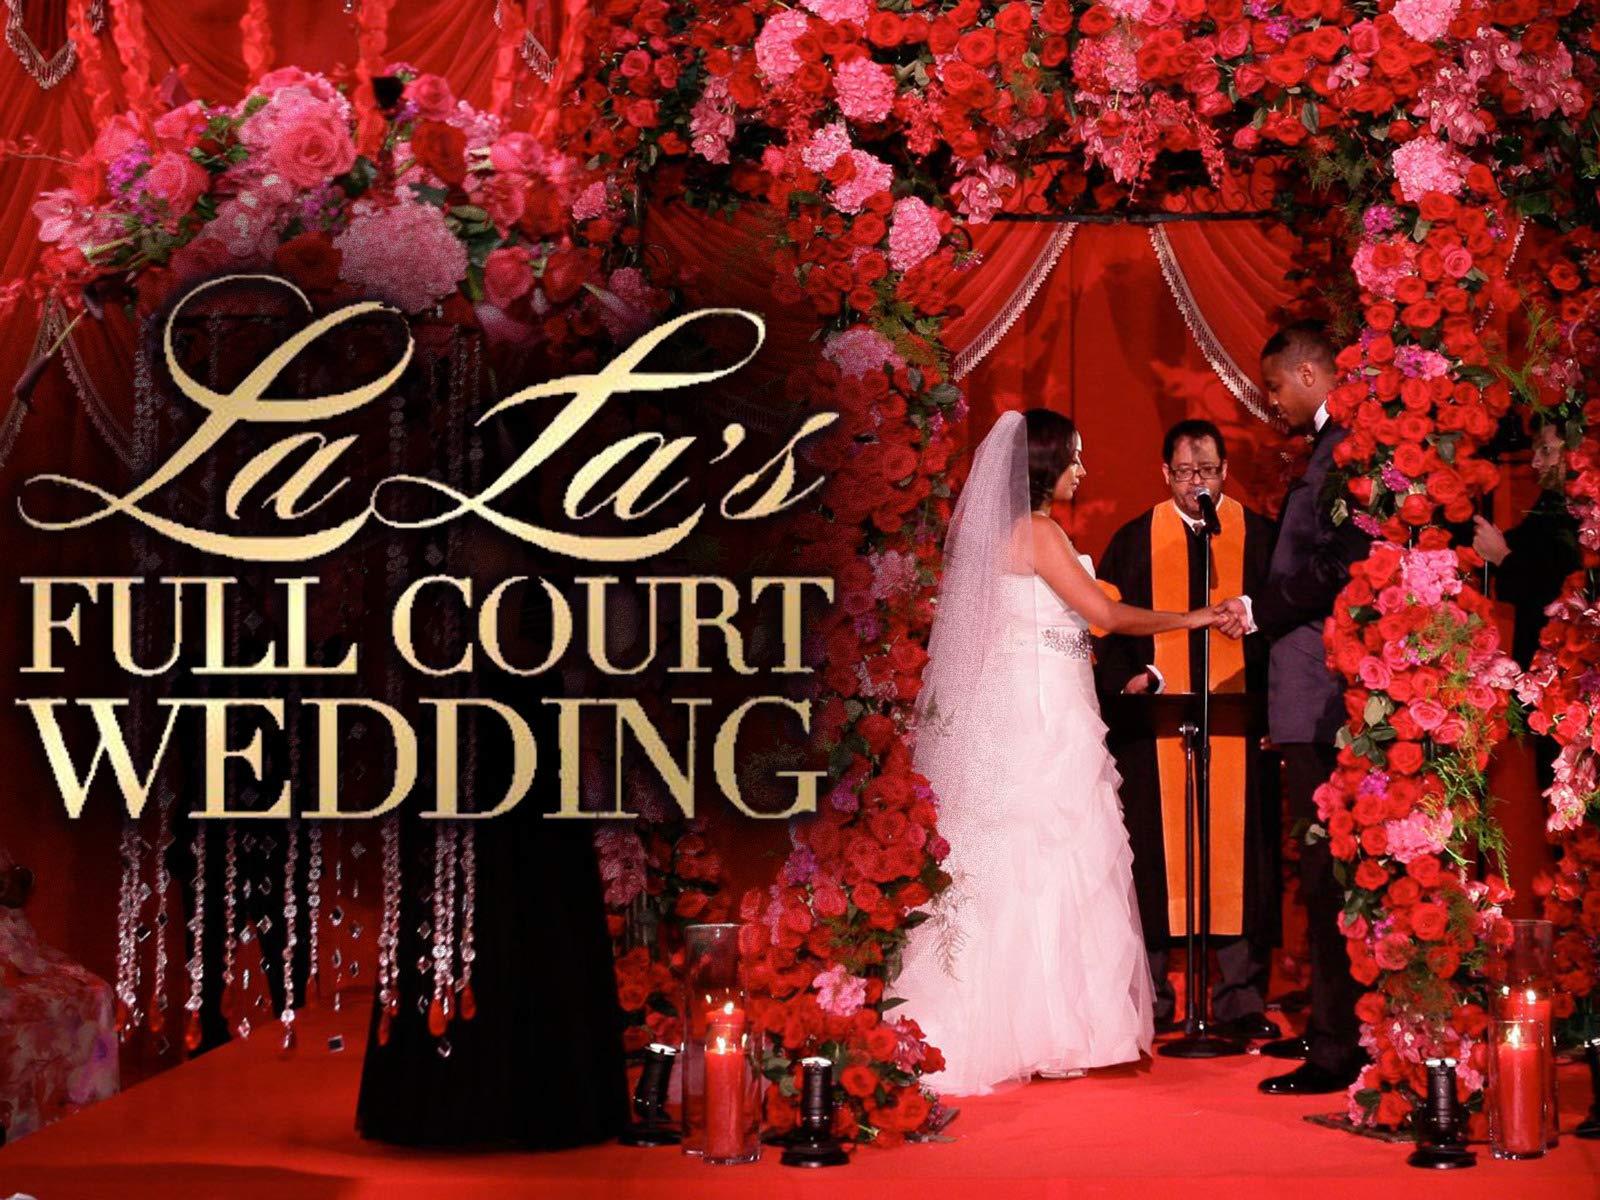 La La's Full Court Wedding